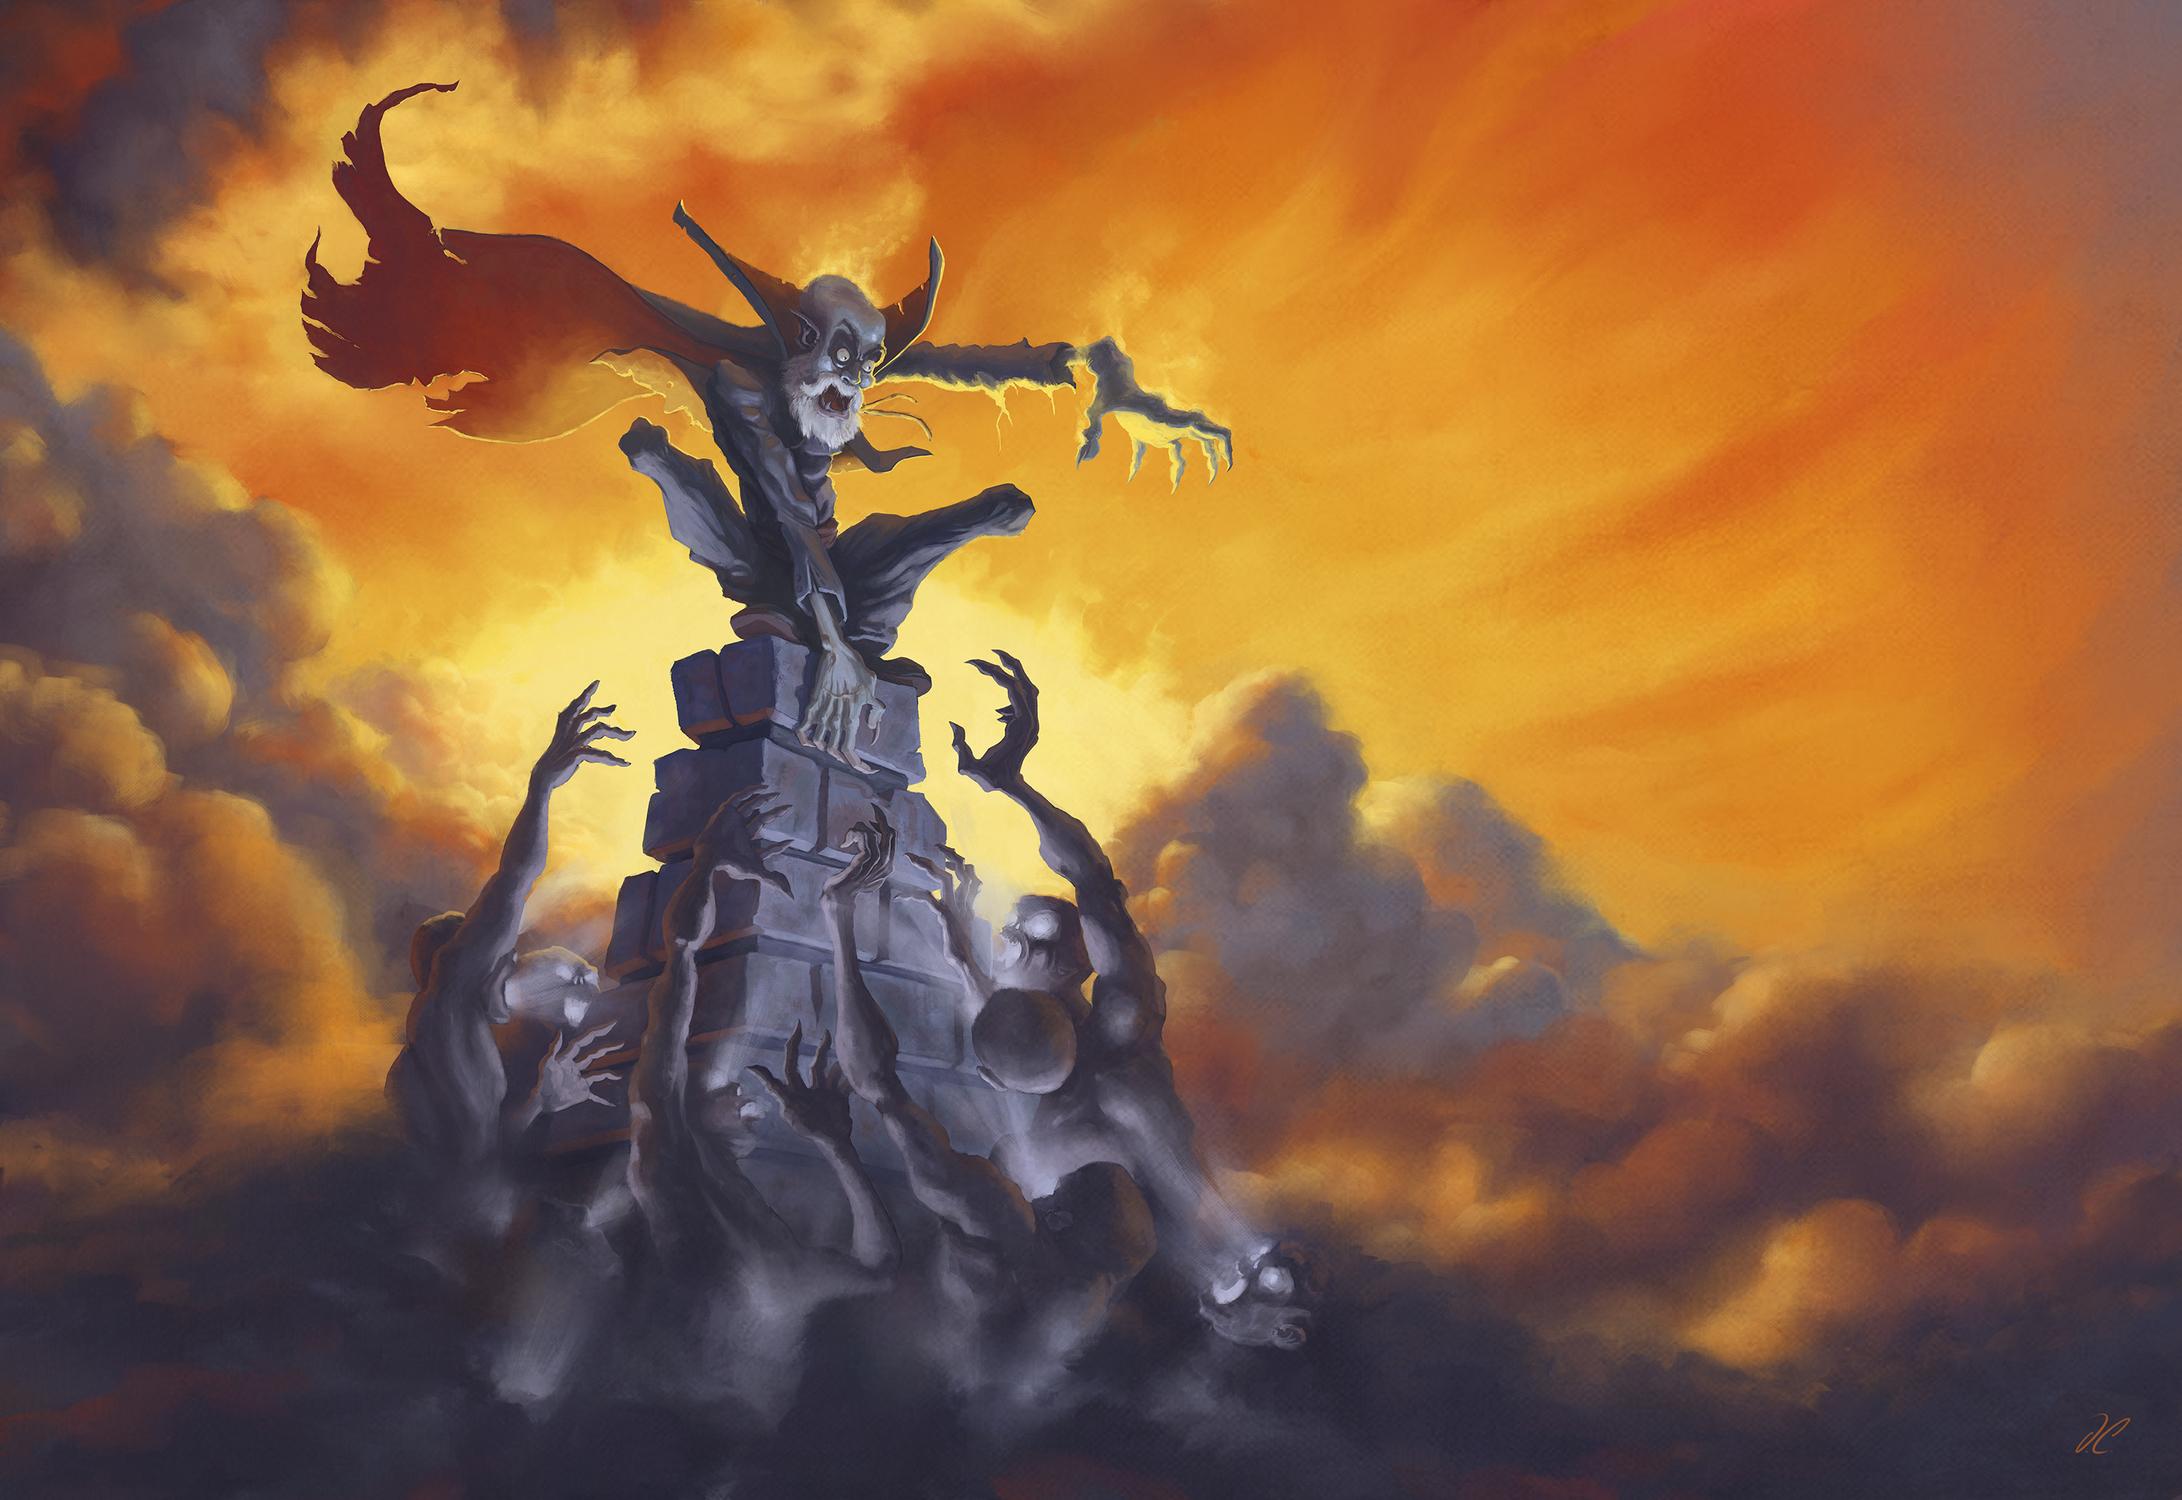 Vampire VS Ghouls Artwork by David Calabrese